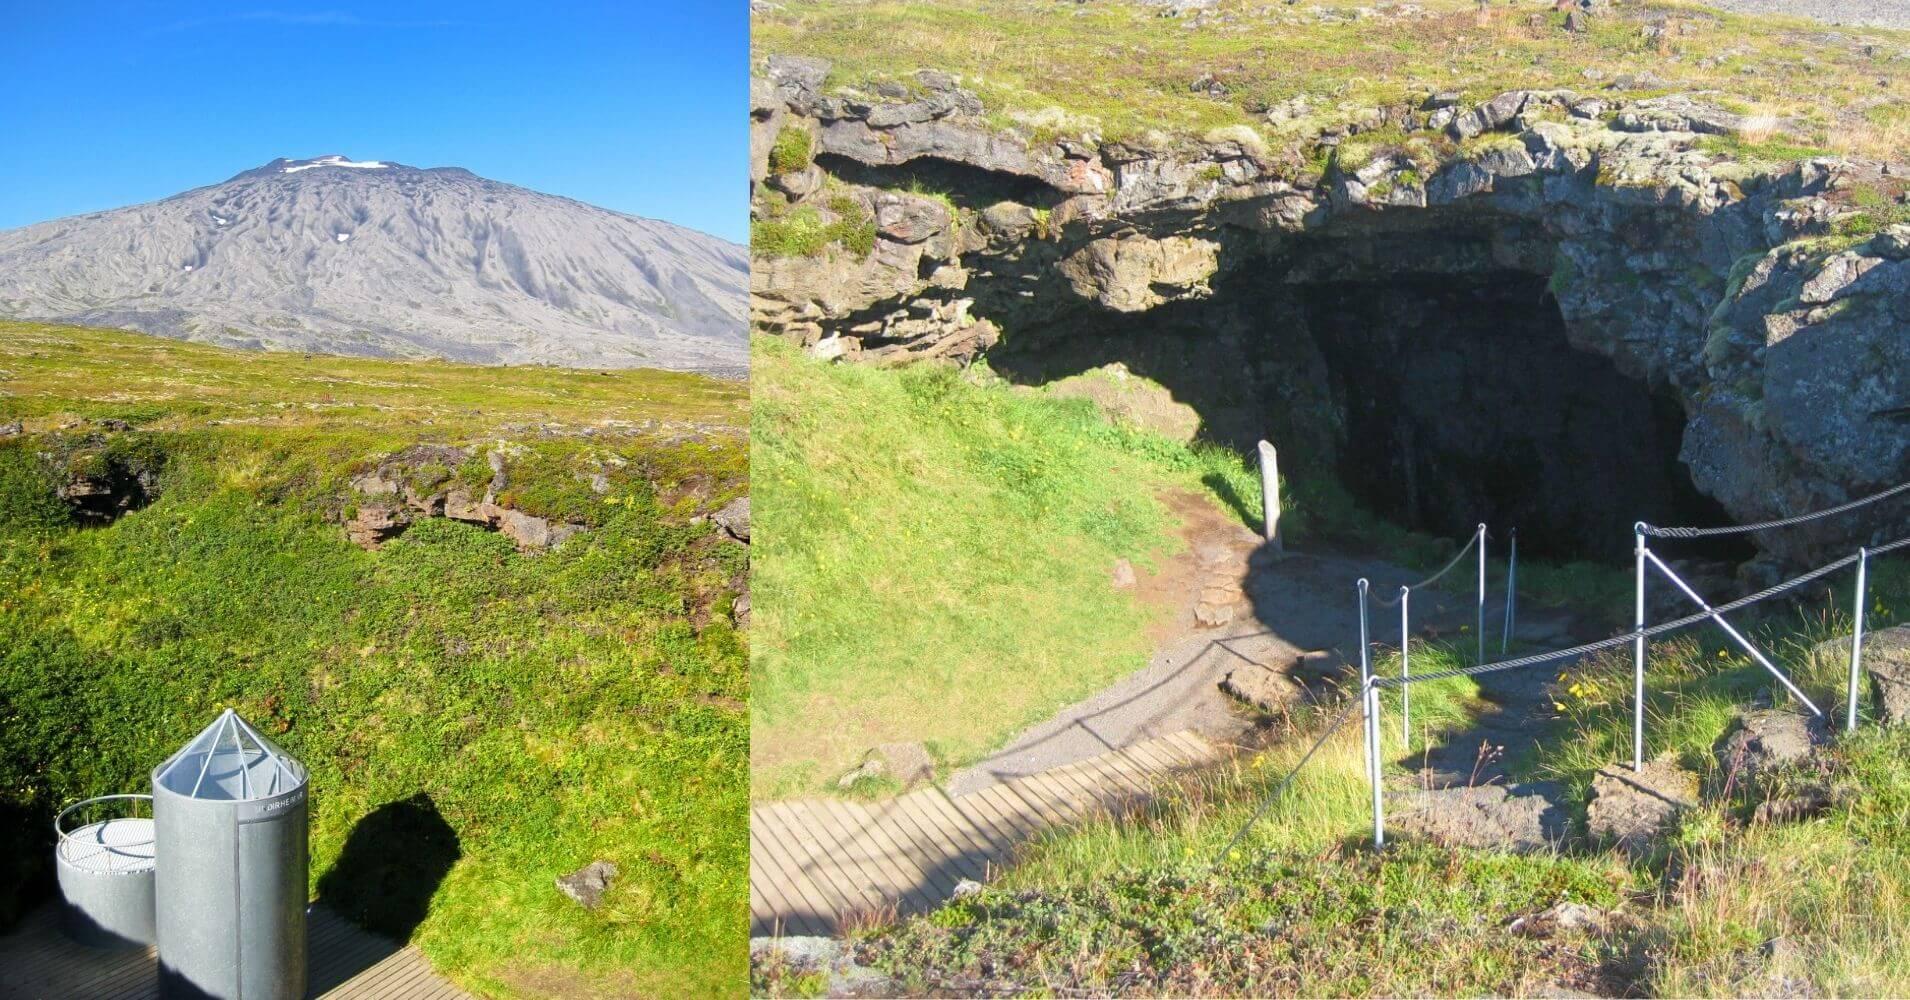 Parque Nacional Snaefells. Cueva de Vatnshellir. Hellnar, Vesturland. Islandia.